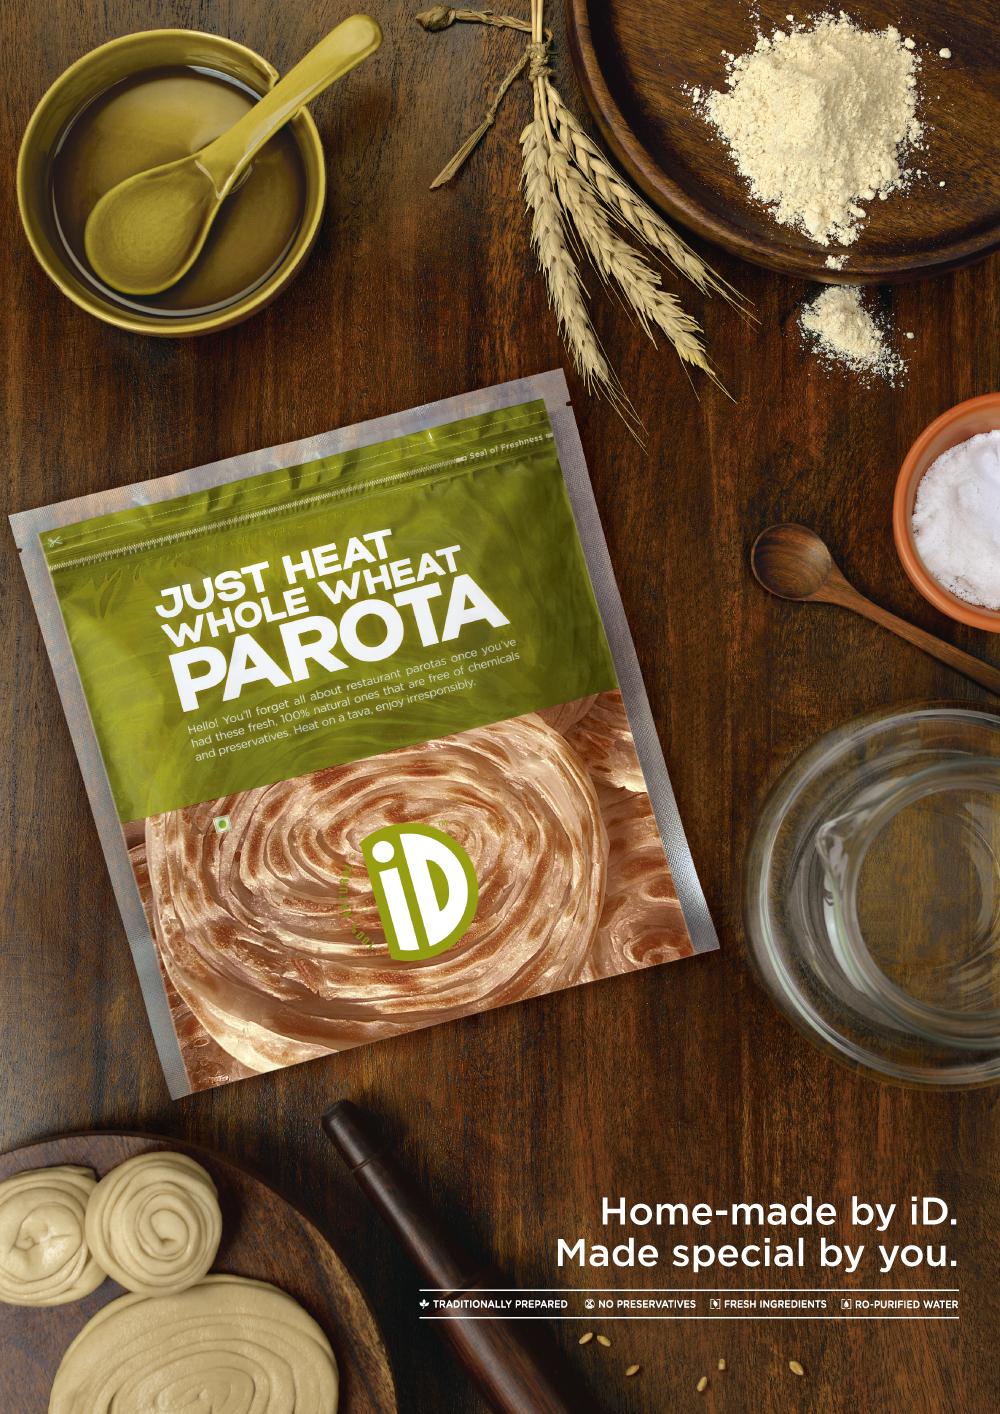 IDLaunch2015-Parota-Wholewheat.jpg